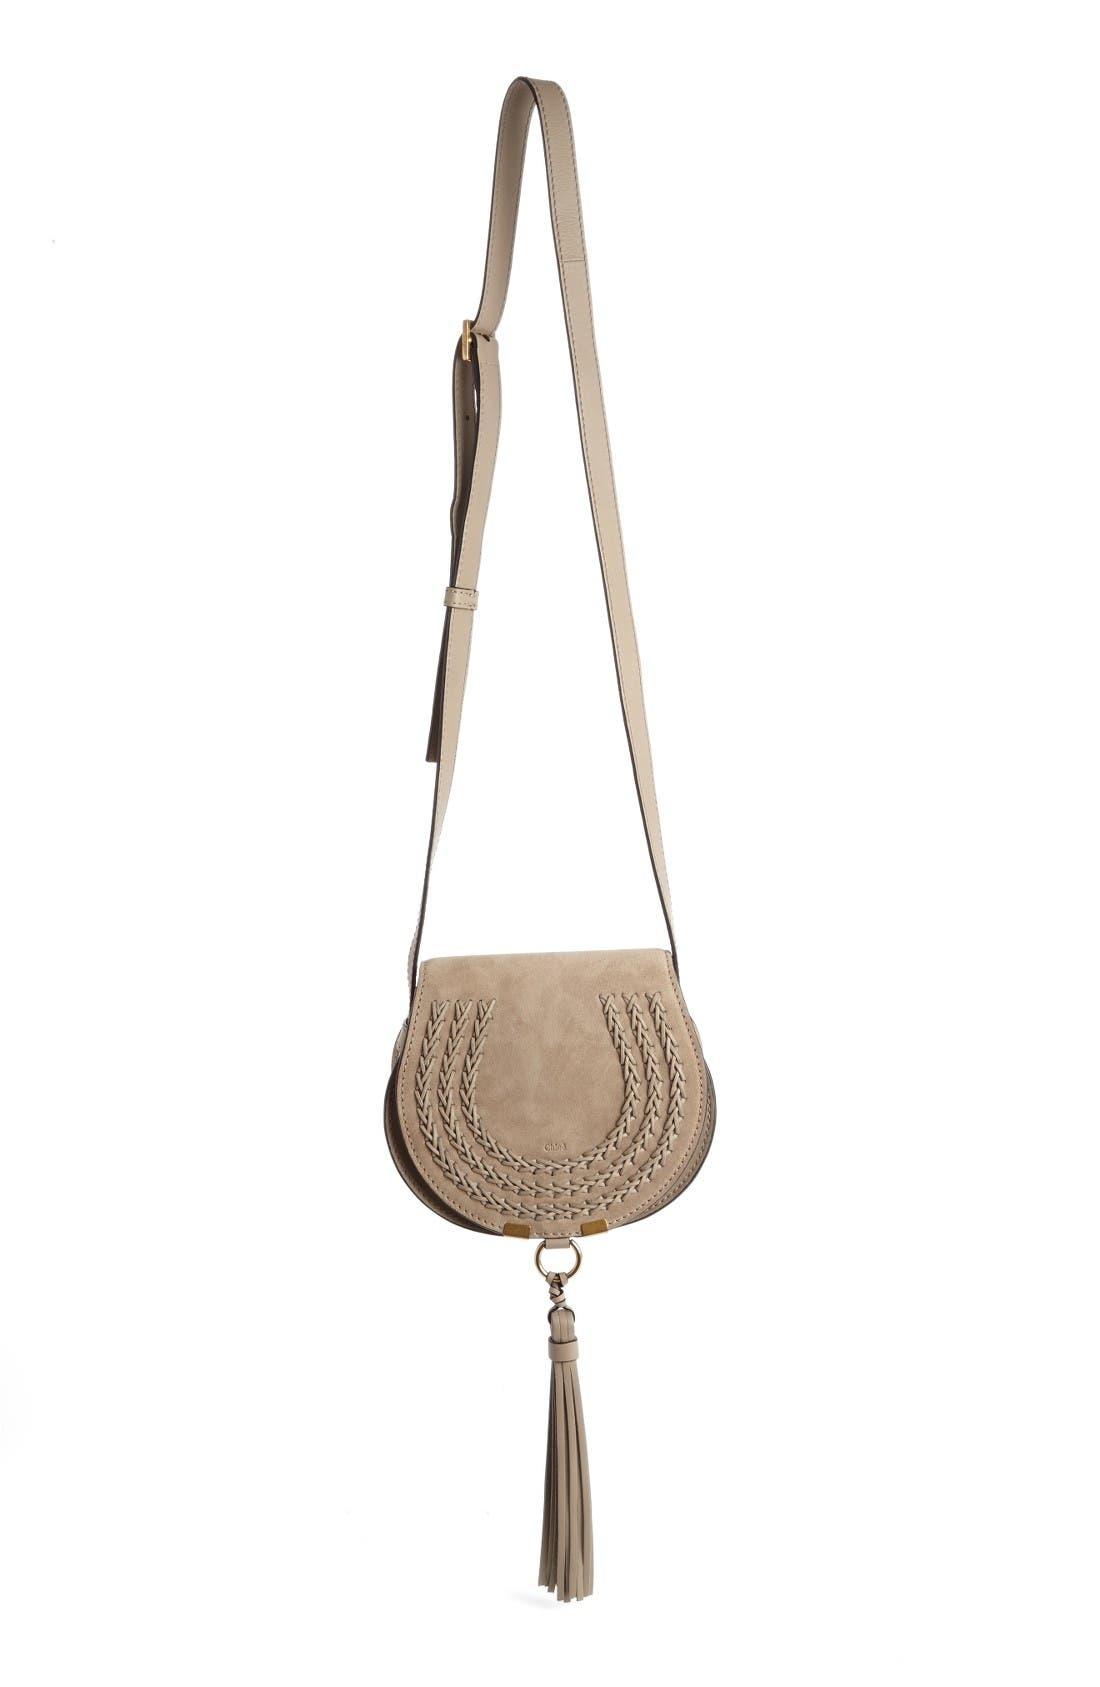 Alternate Image 1 Selected - Chloé 'Mini Marcie' Suede Saddle Bag